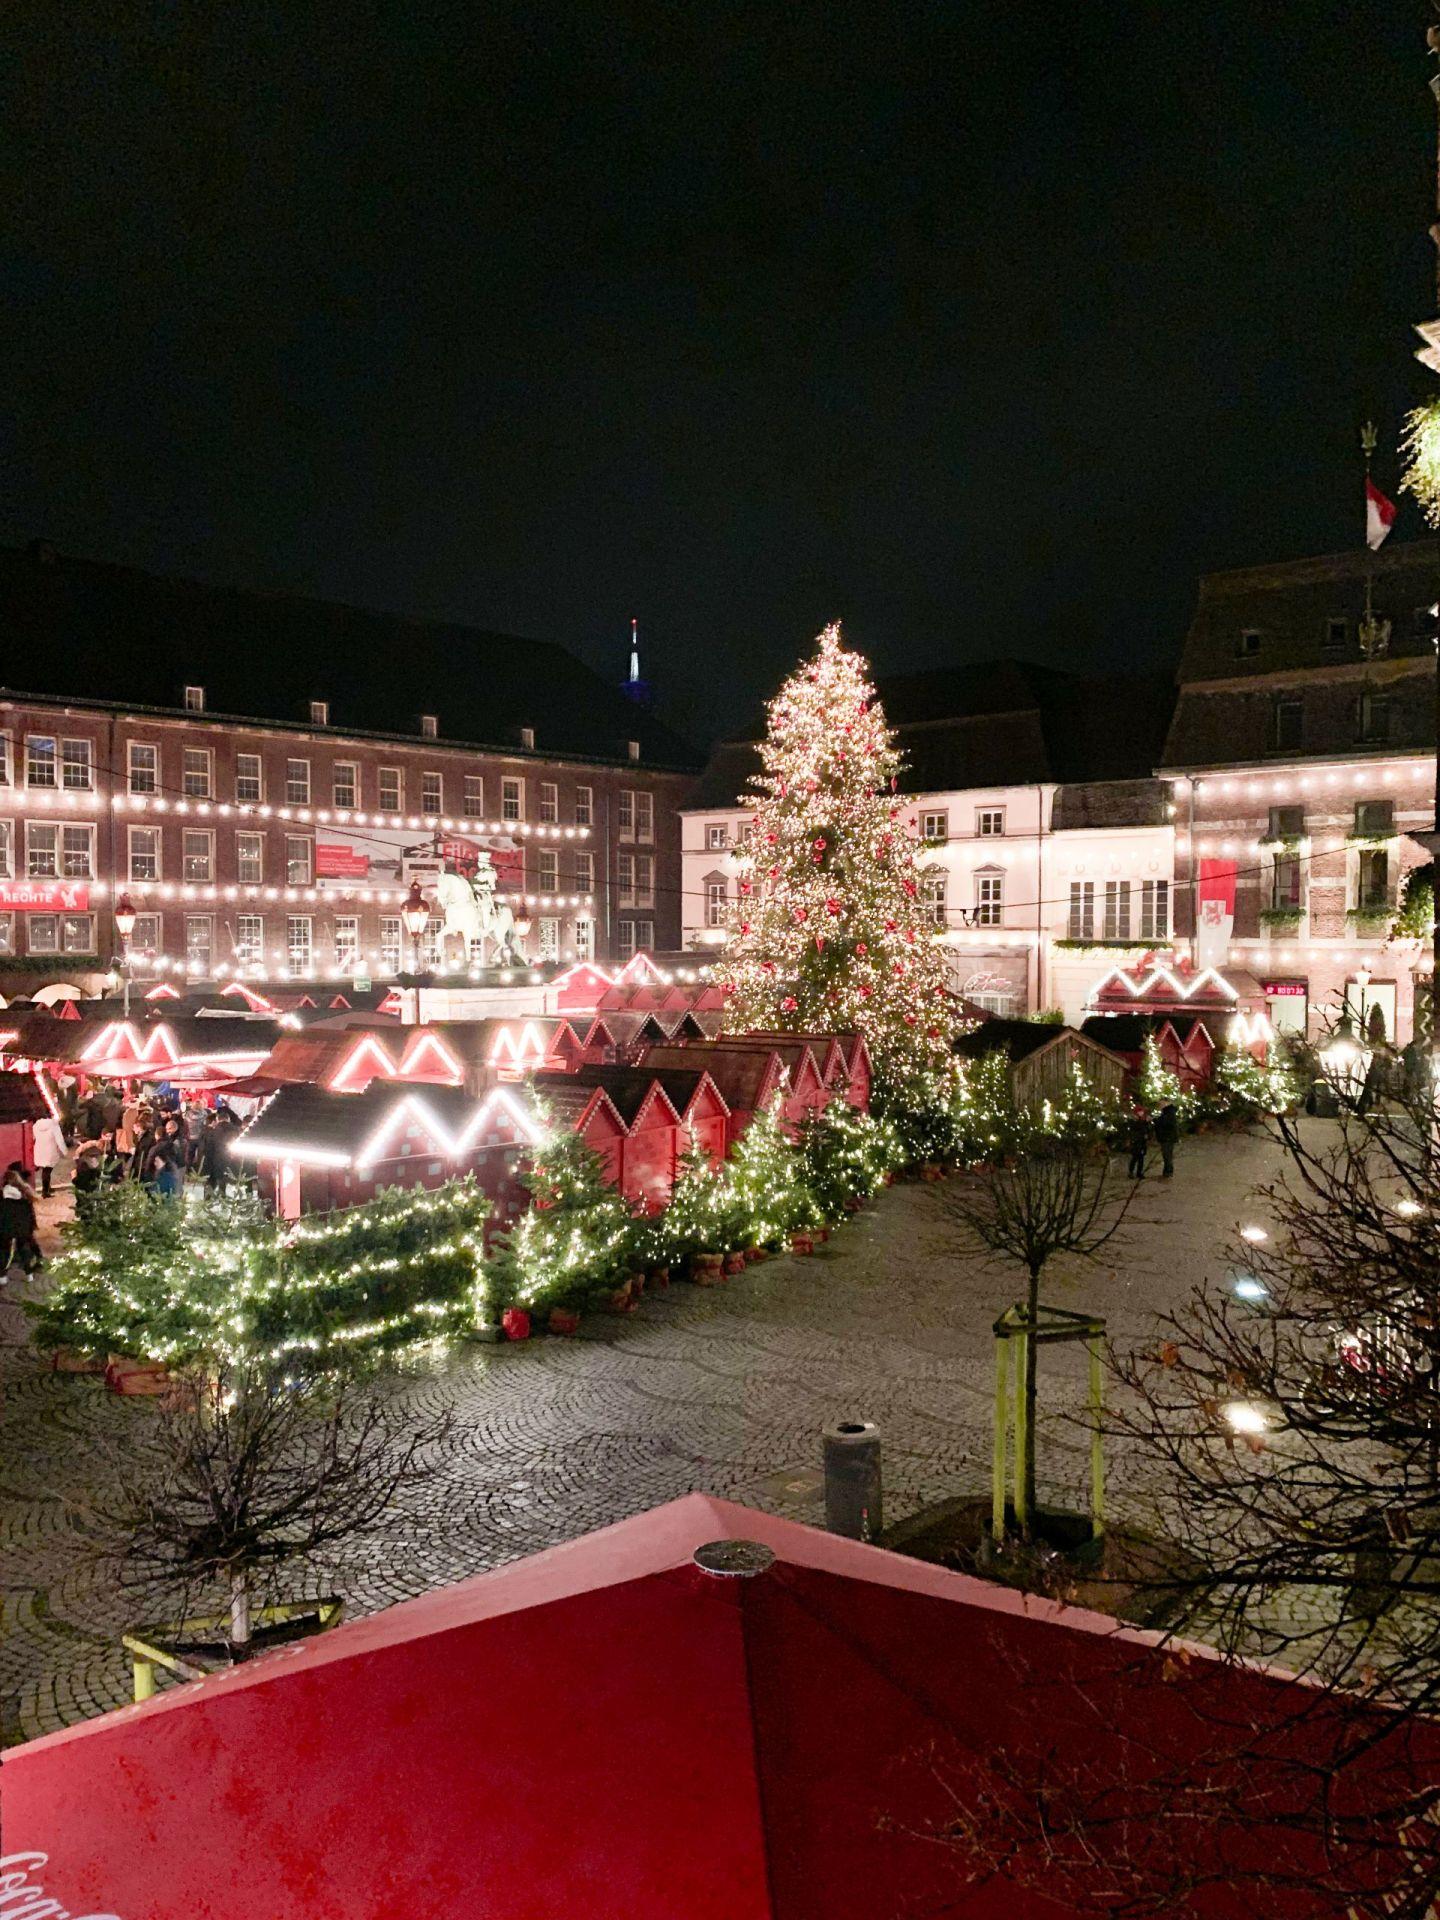 Dusseldorf Christmas market hotel